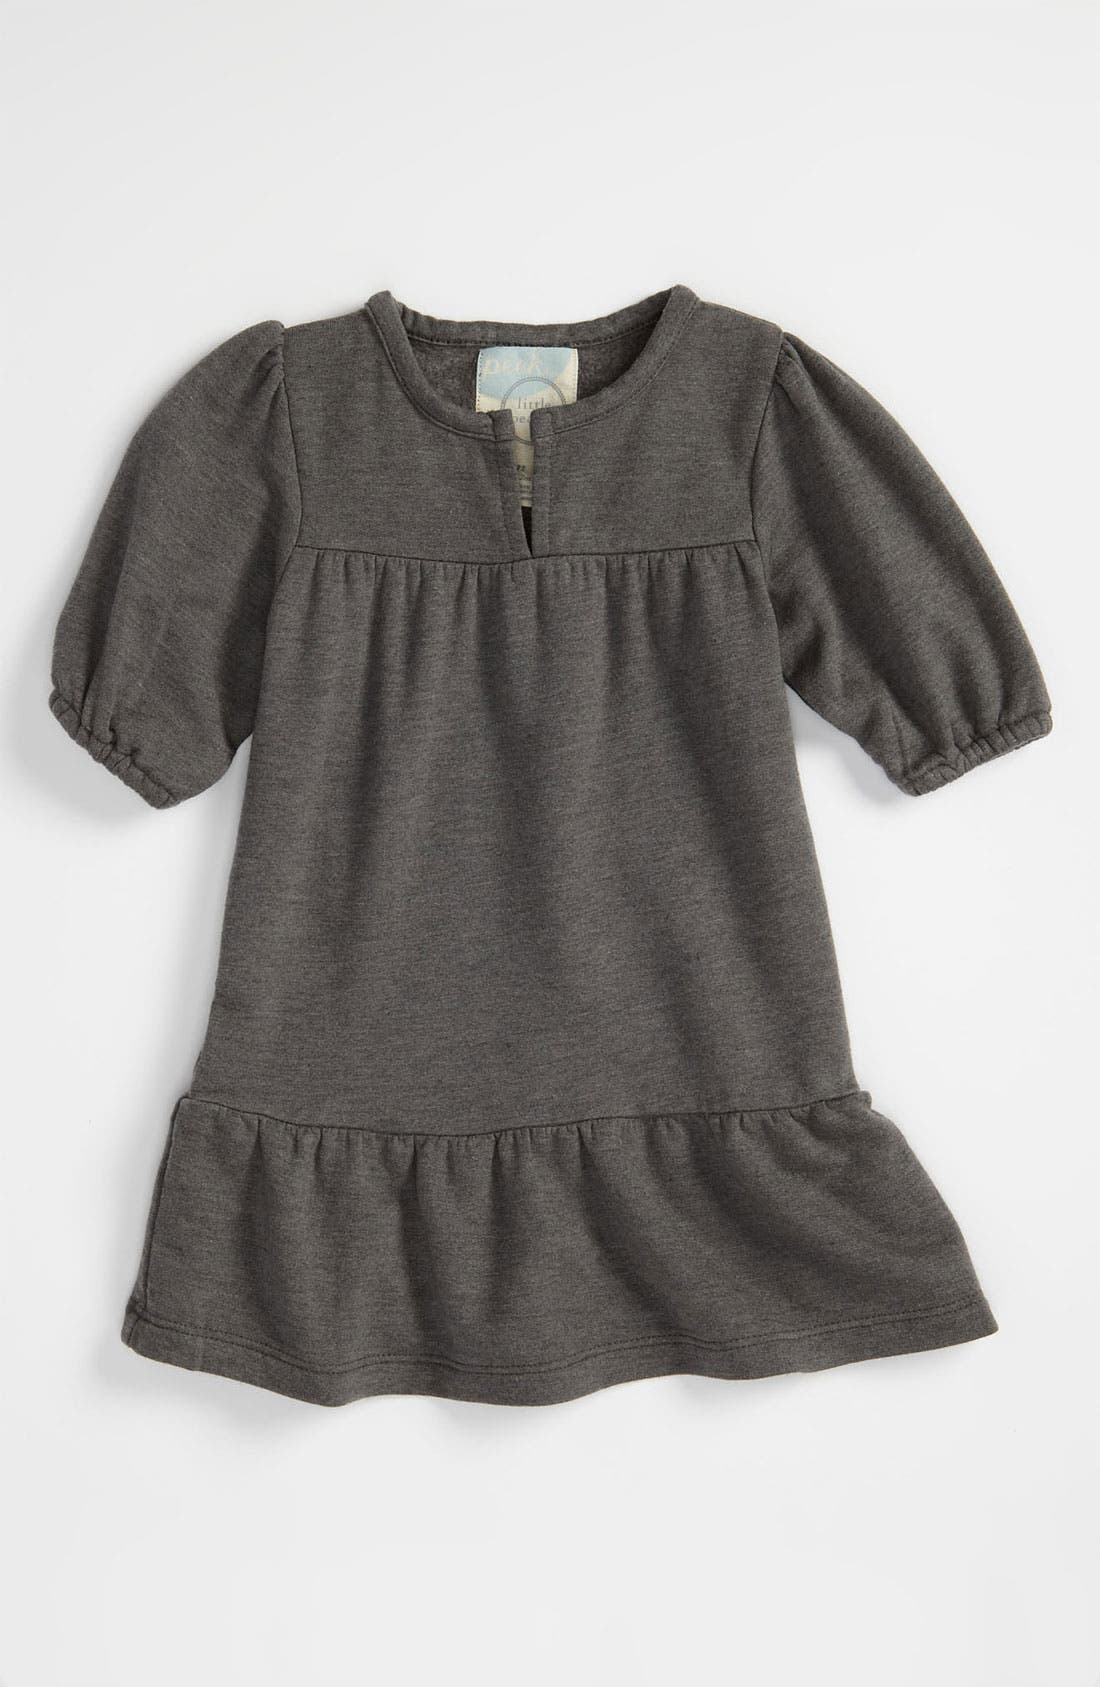 Alternate Image 1 Selected - Peek 'Baby Eliza' Dress (Infant)